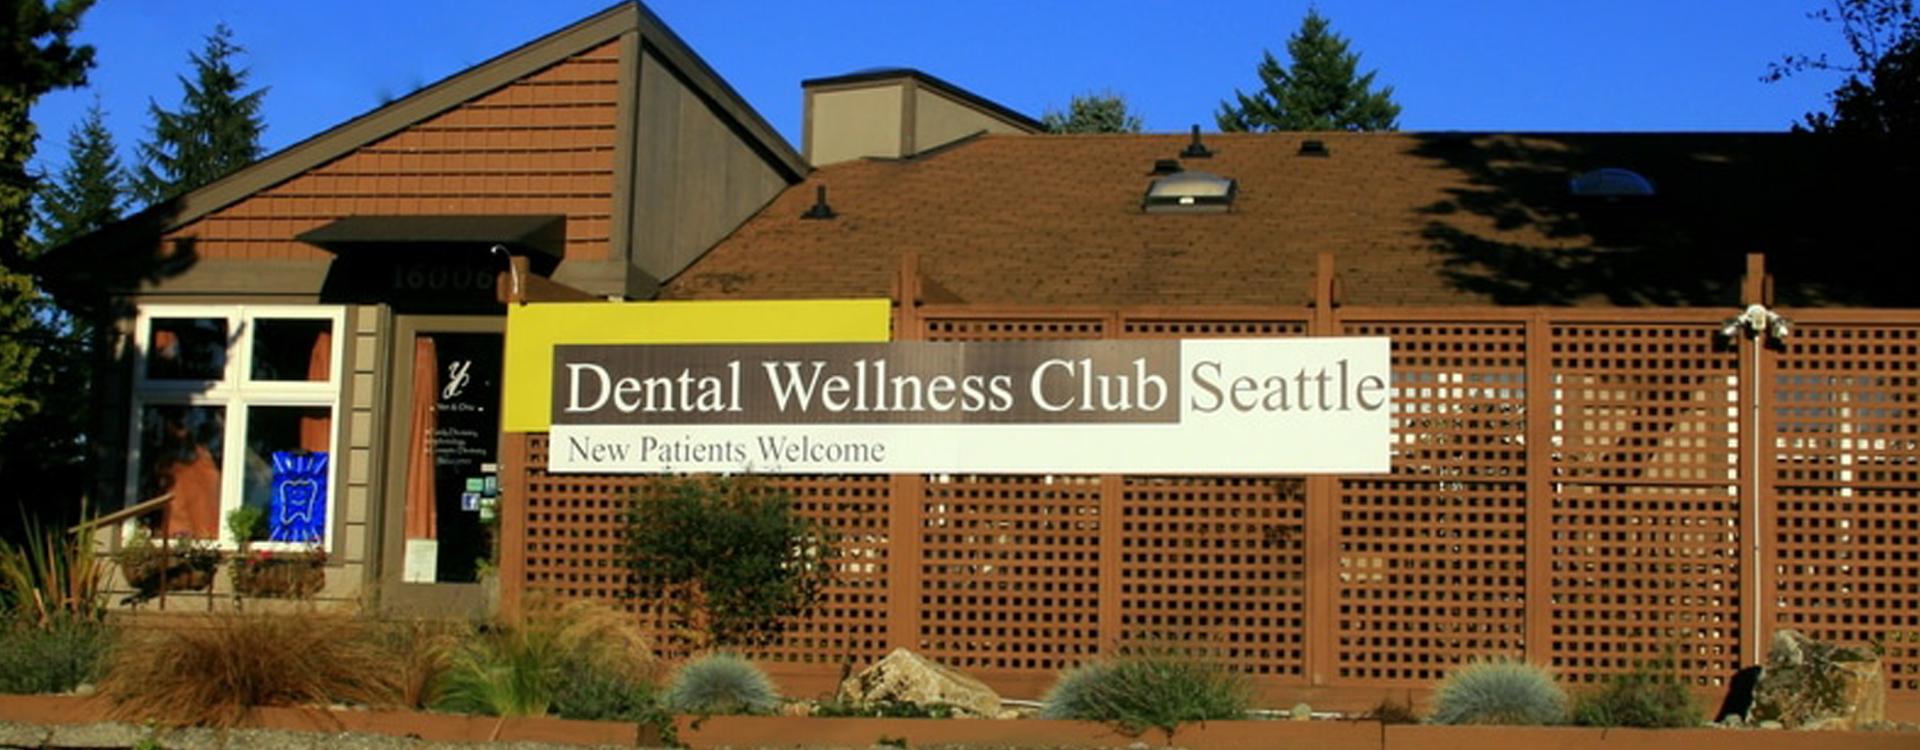 Dental Wellness Club Seattle